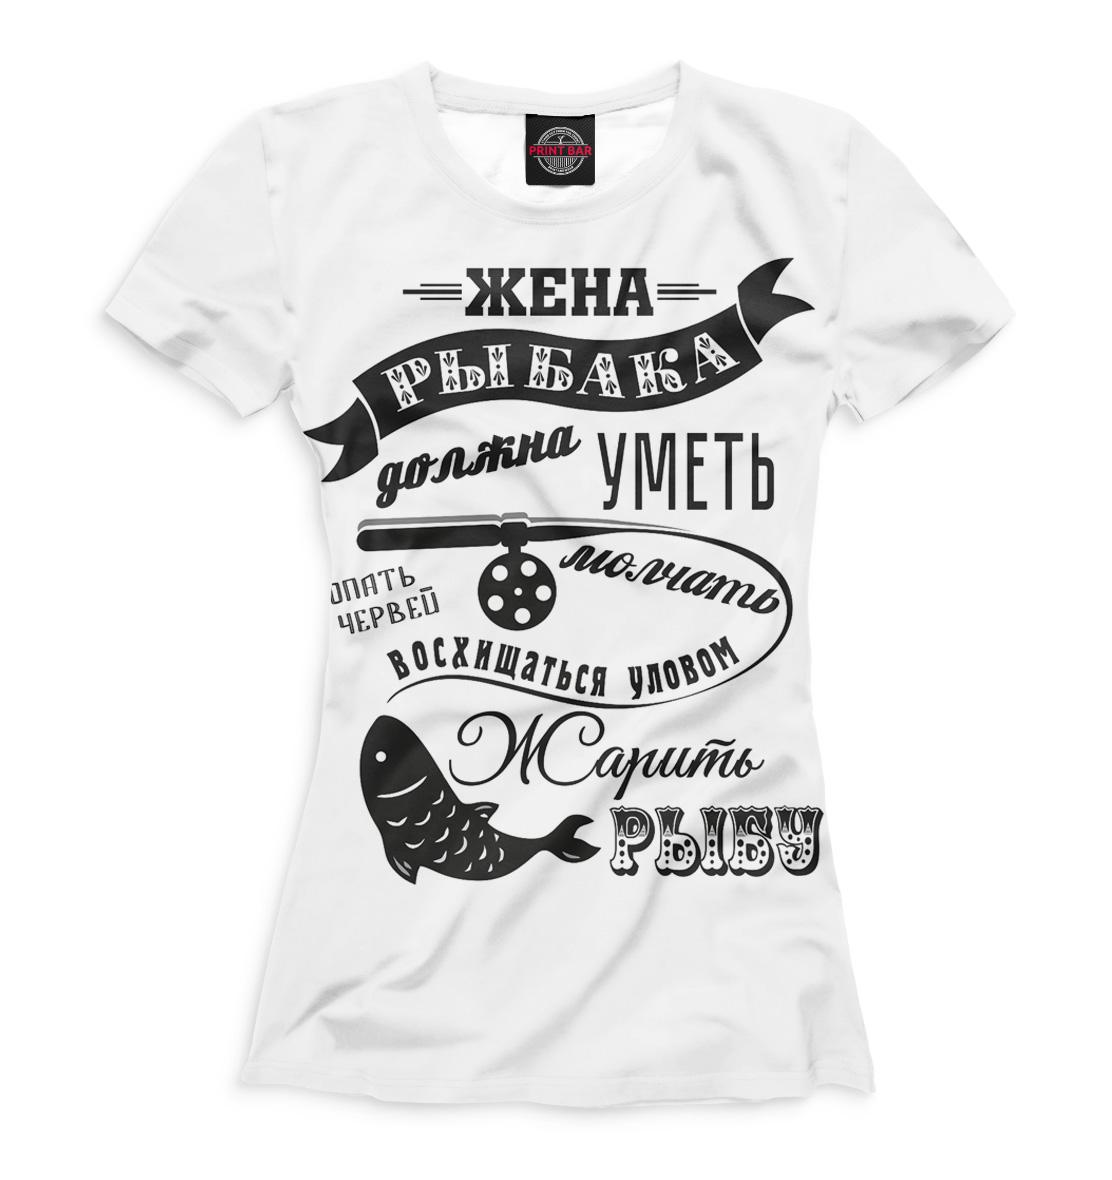 Купить Жена рыбака, Printbar, Футболки, FSH-965117-fut-1